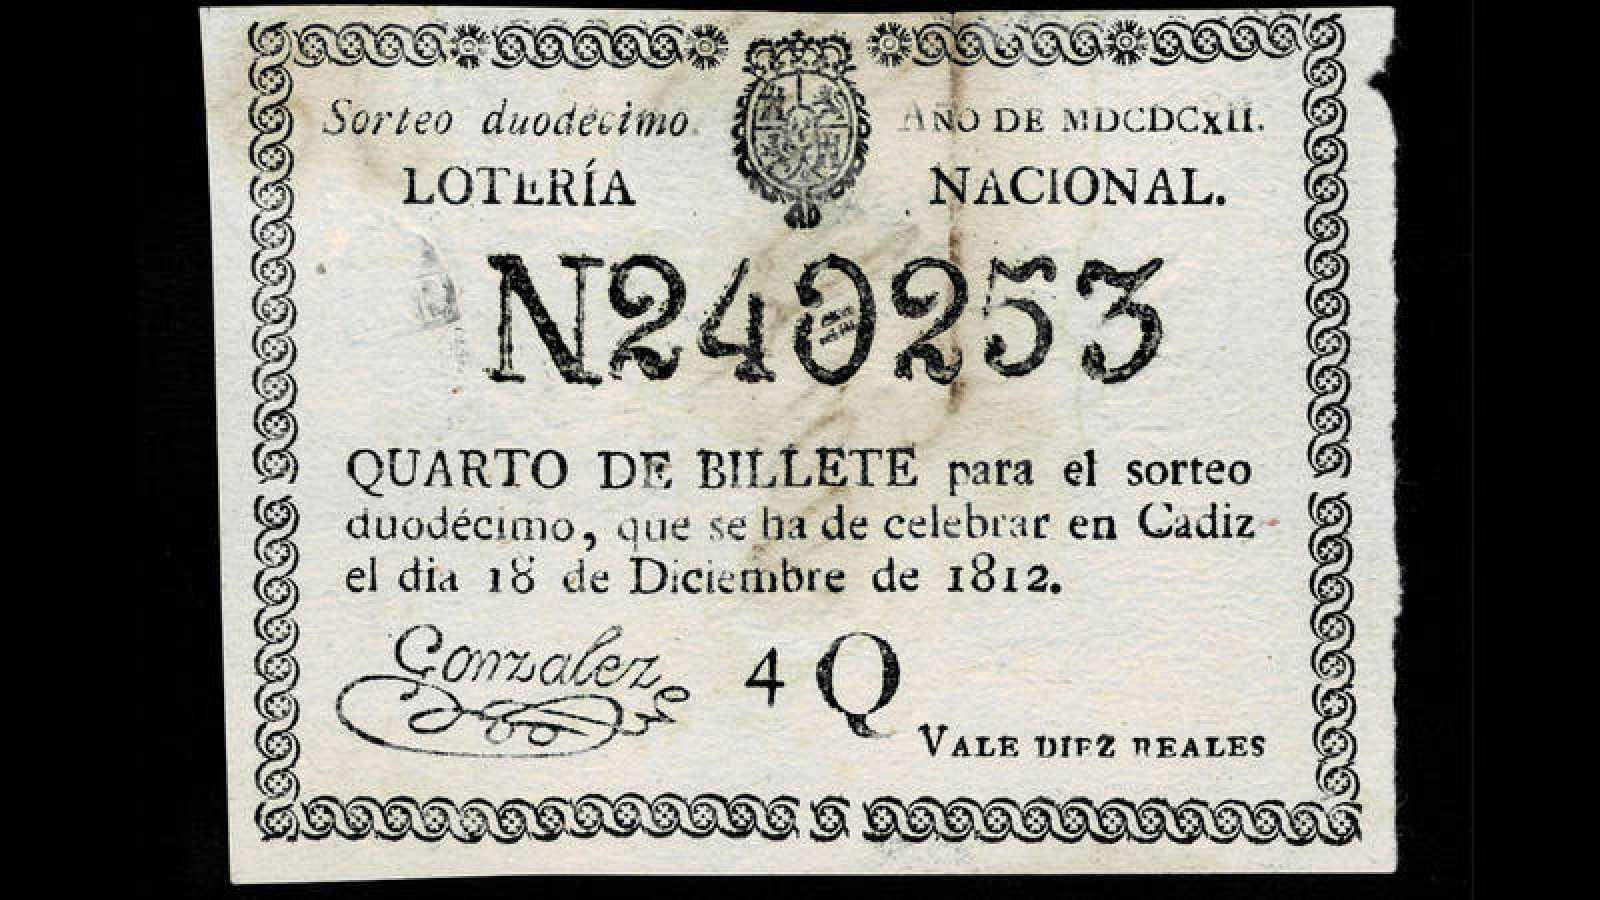 Boleto del 18 de diciembre de 1812